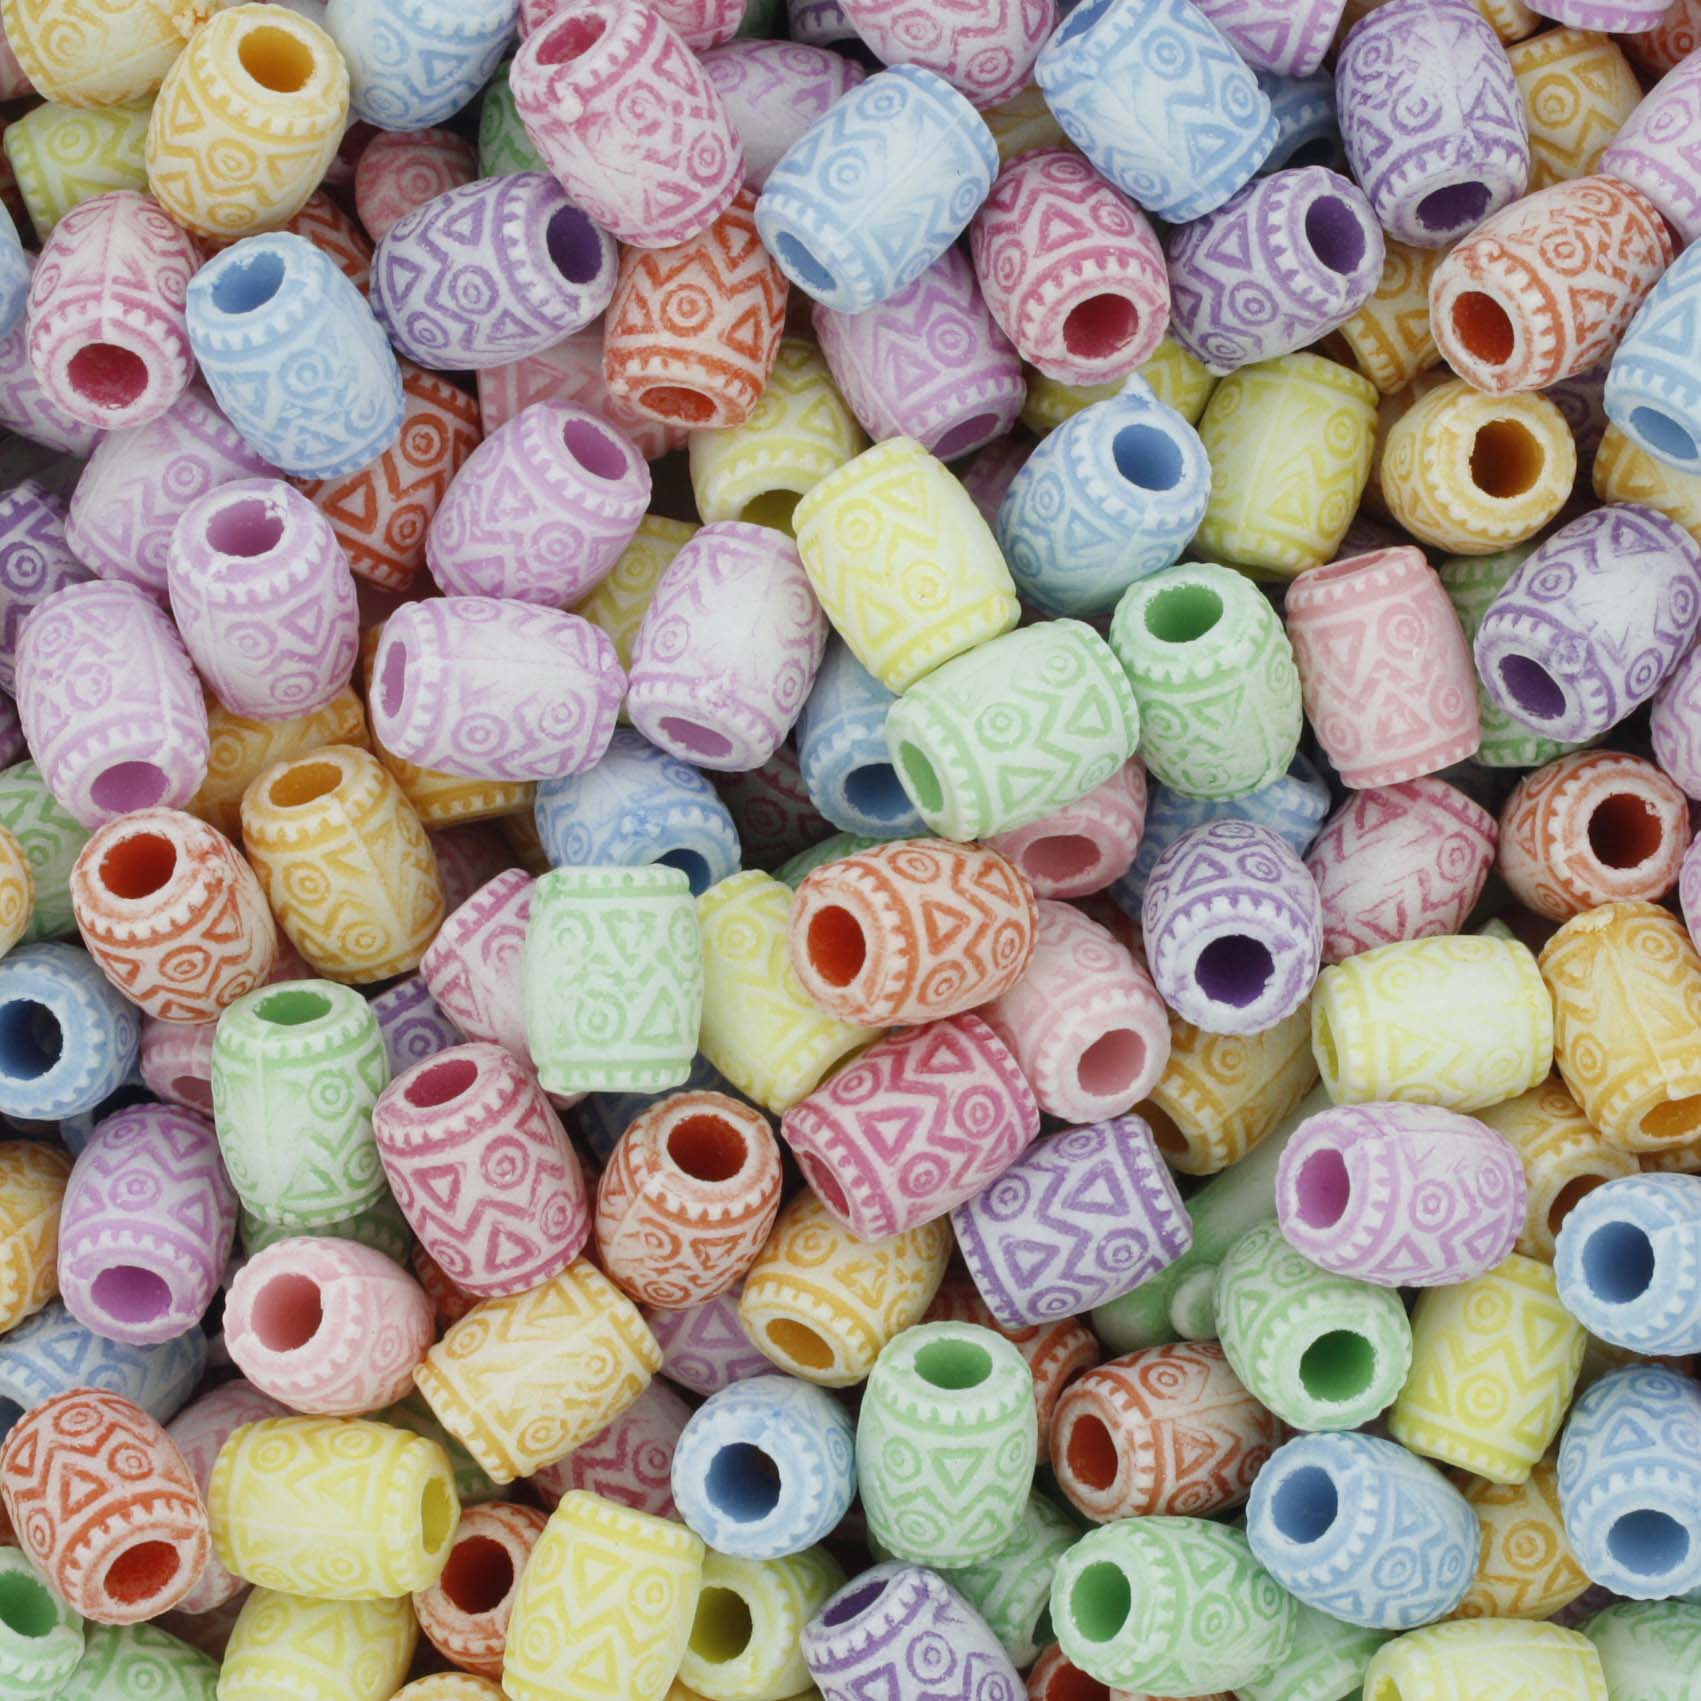 Miçanga Infantil - Tambor Colorido  - Stéphanie Bijoux® - Peças para Bijuterias e Artesanato